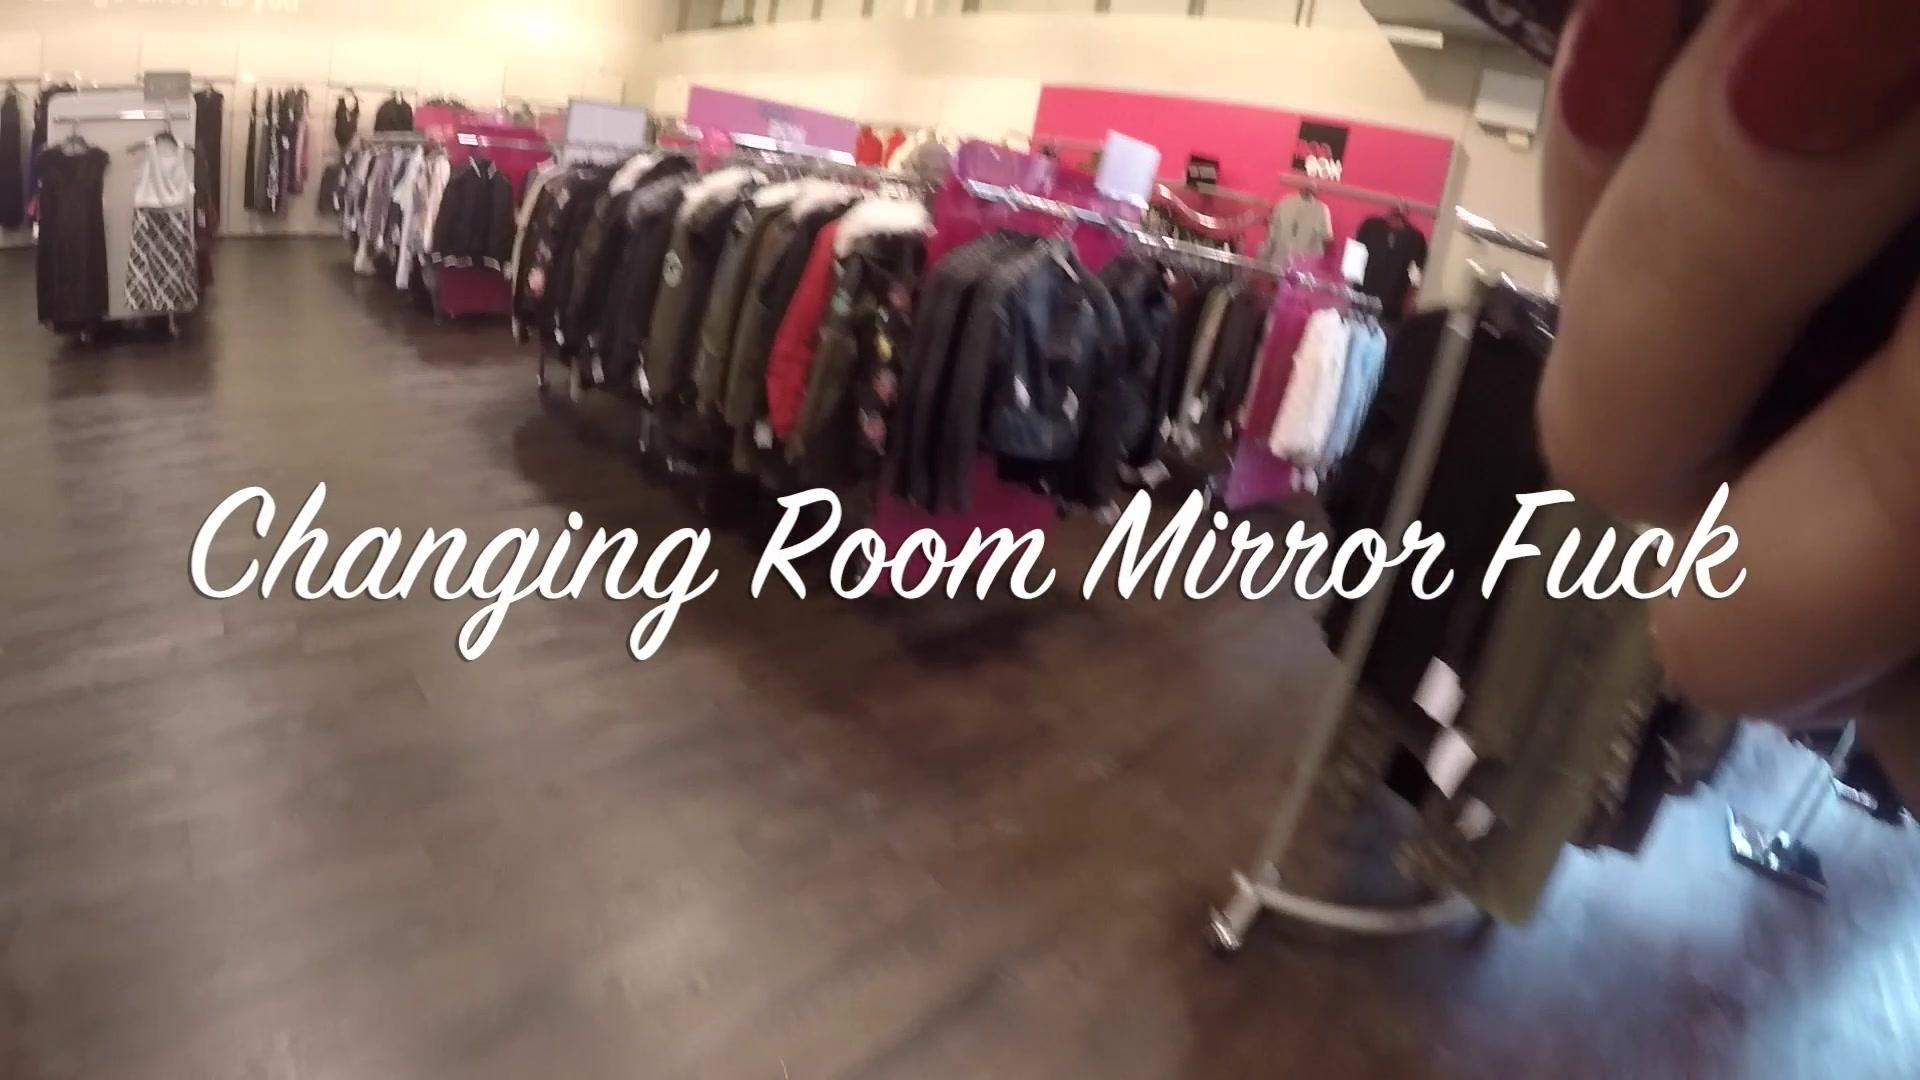 Anastasiaxx89 - Changing Room Mirror Fuck